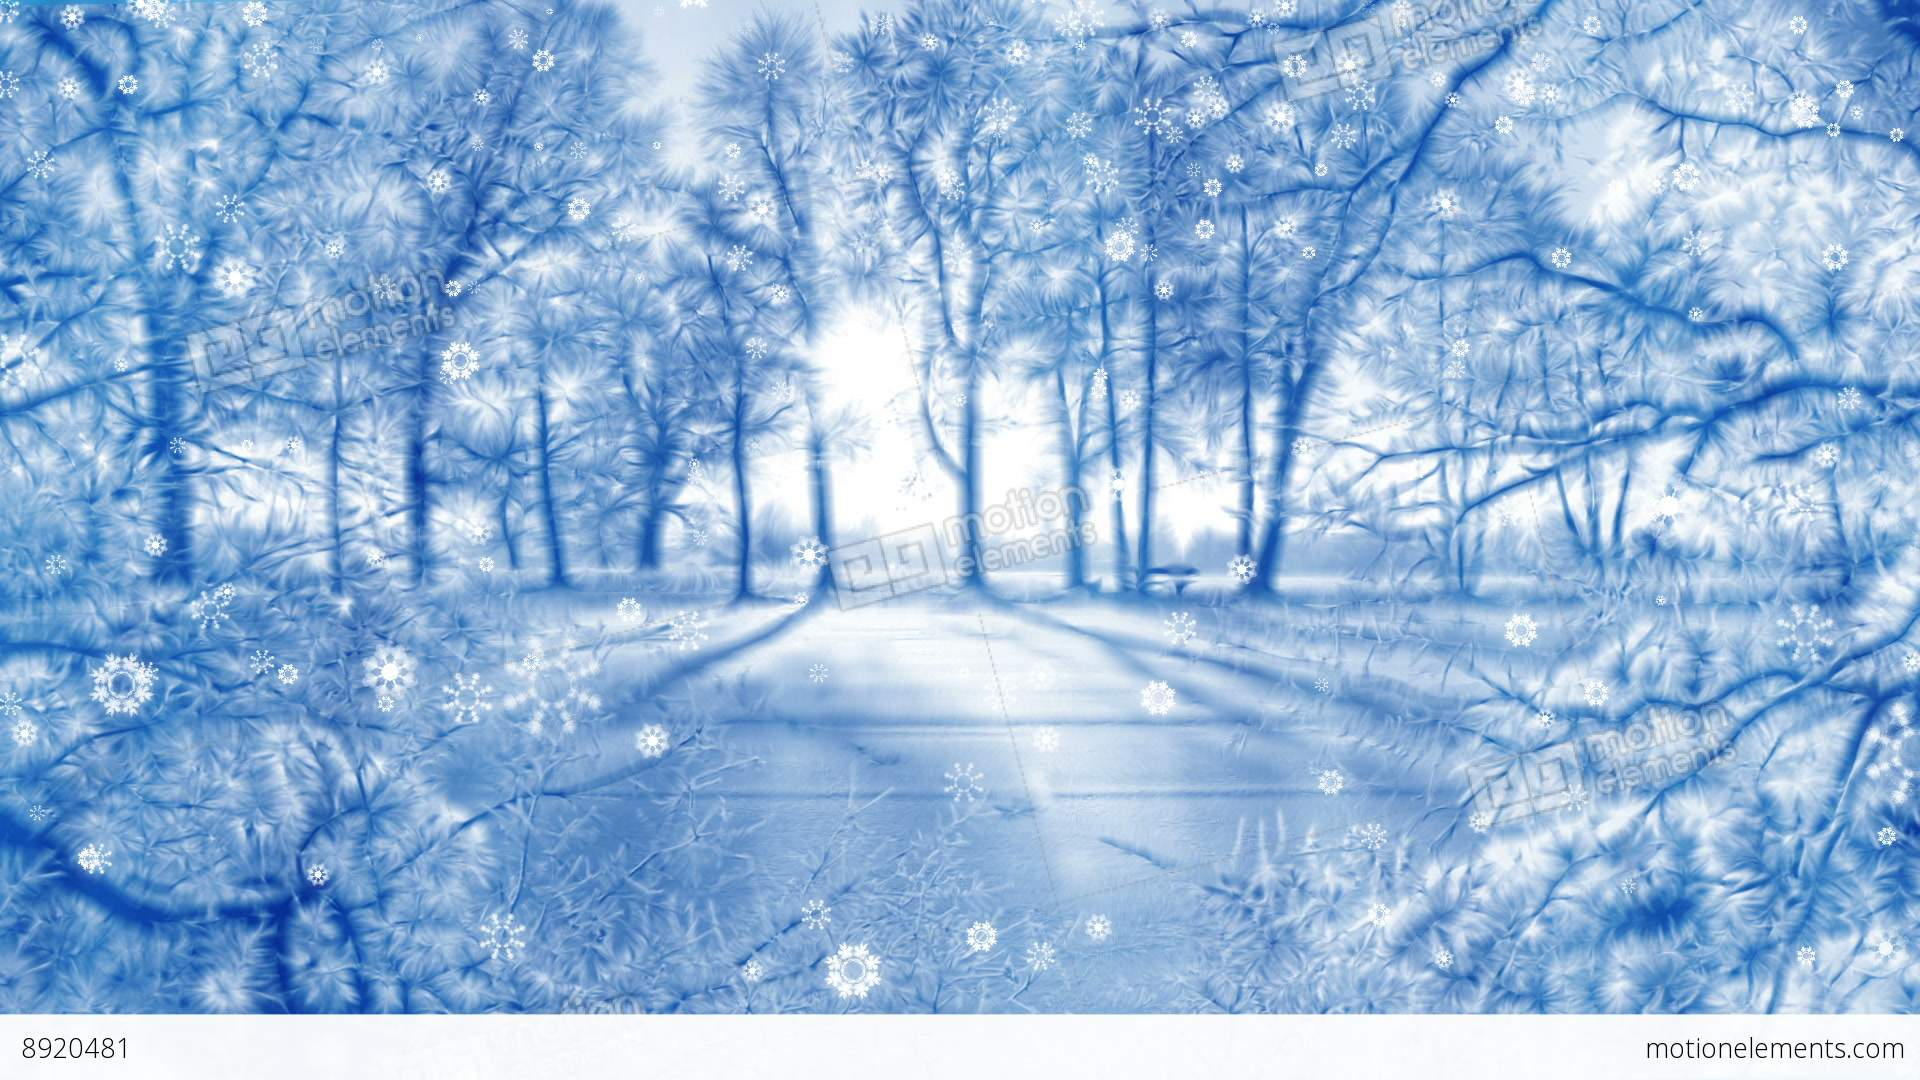 Winter Background Animation Loop Stock Animation  8920481